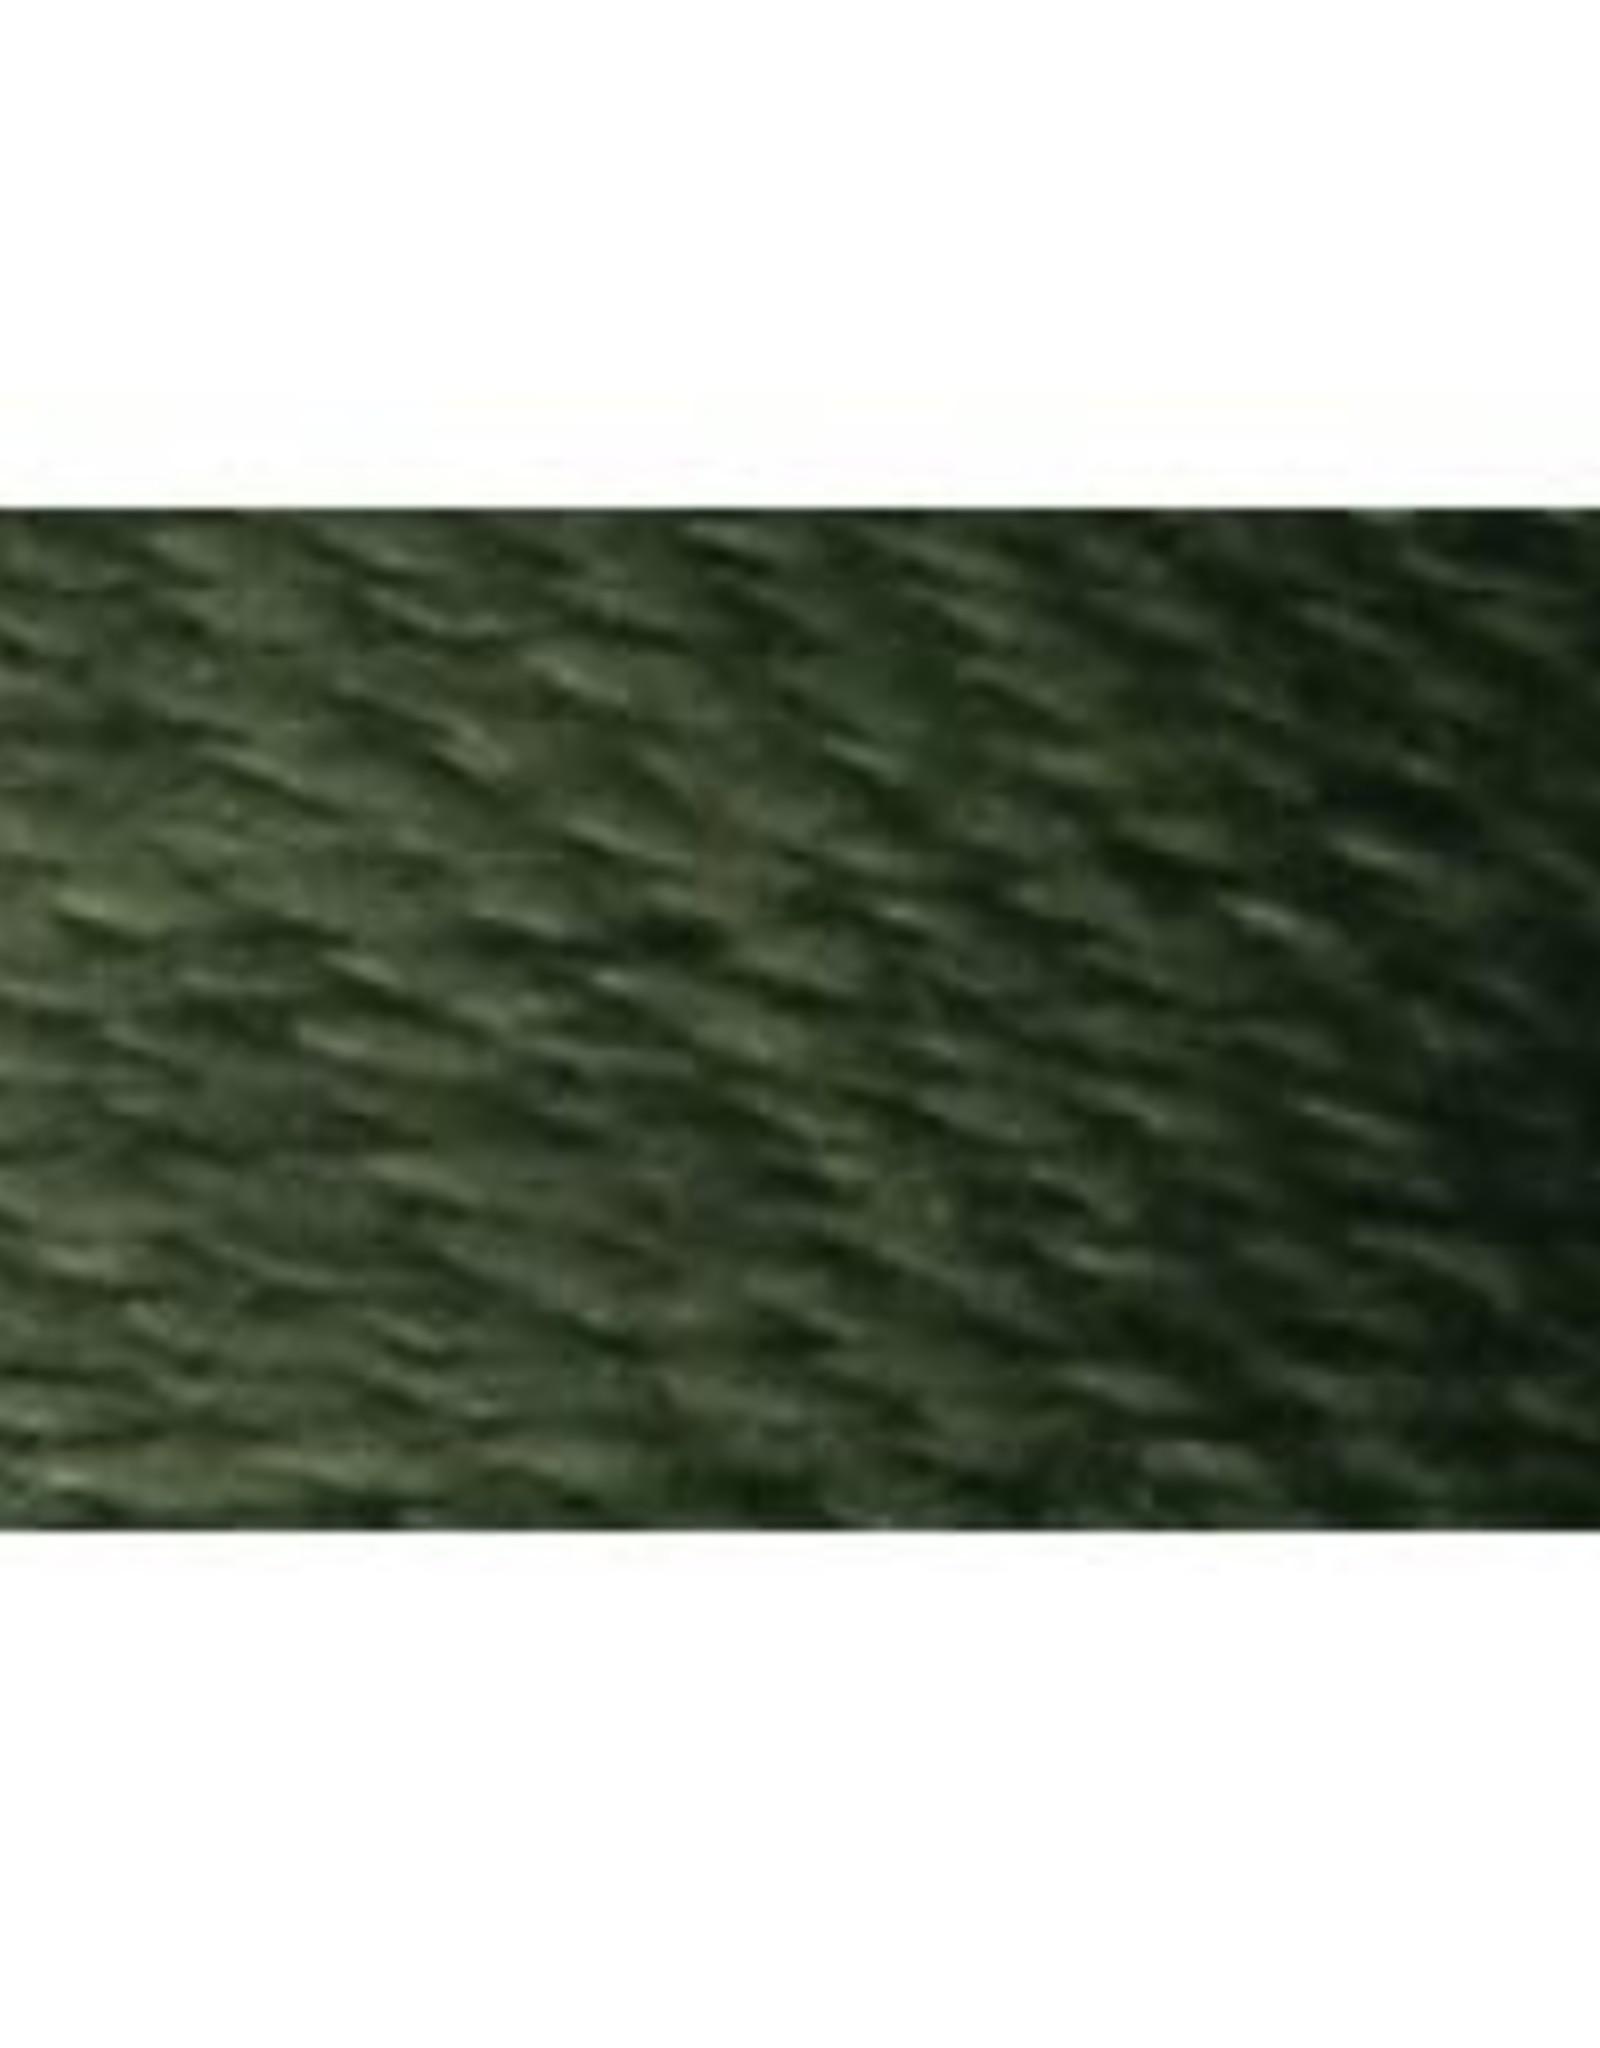 Dual Duty XP General Purpose Thread 250yd - Spinach